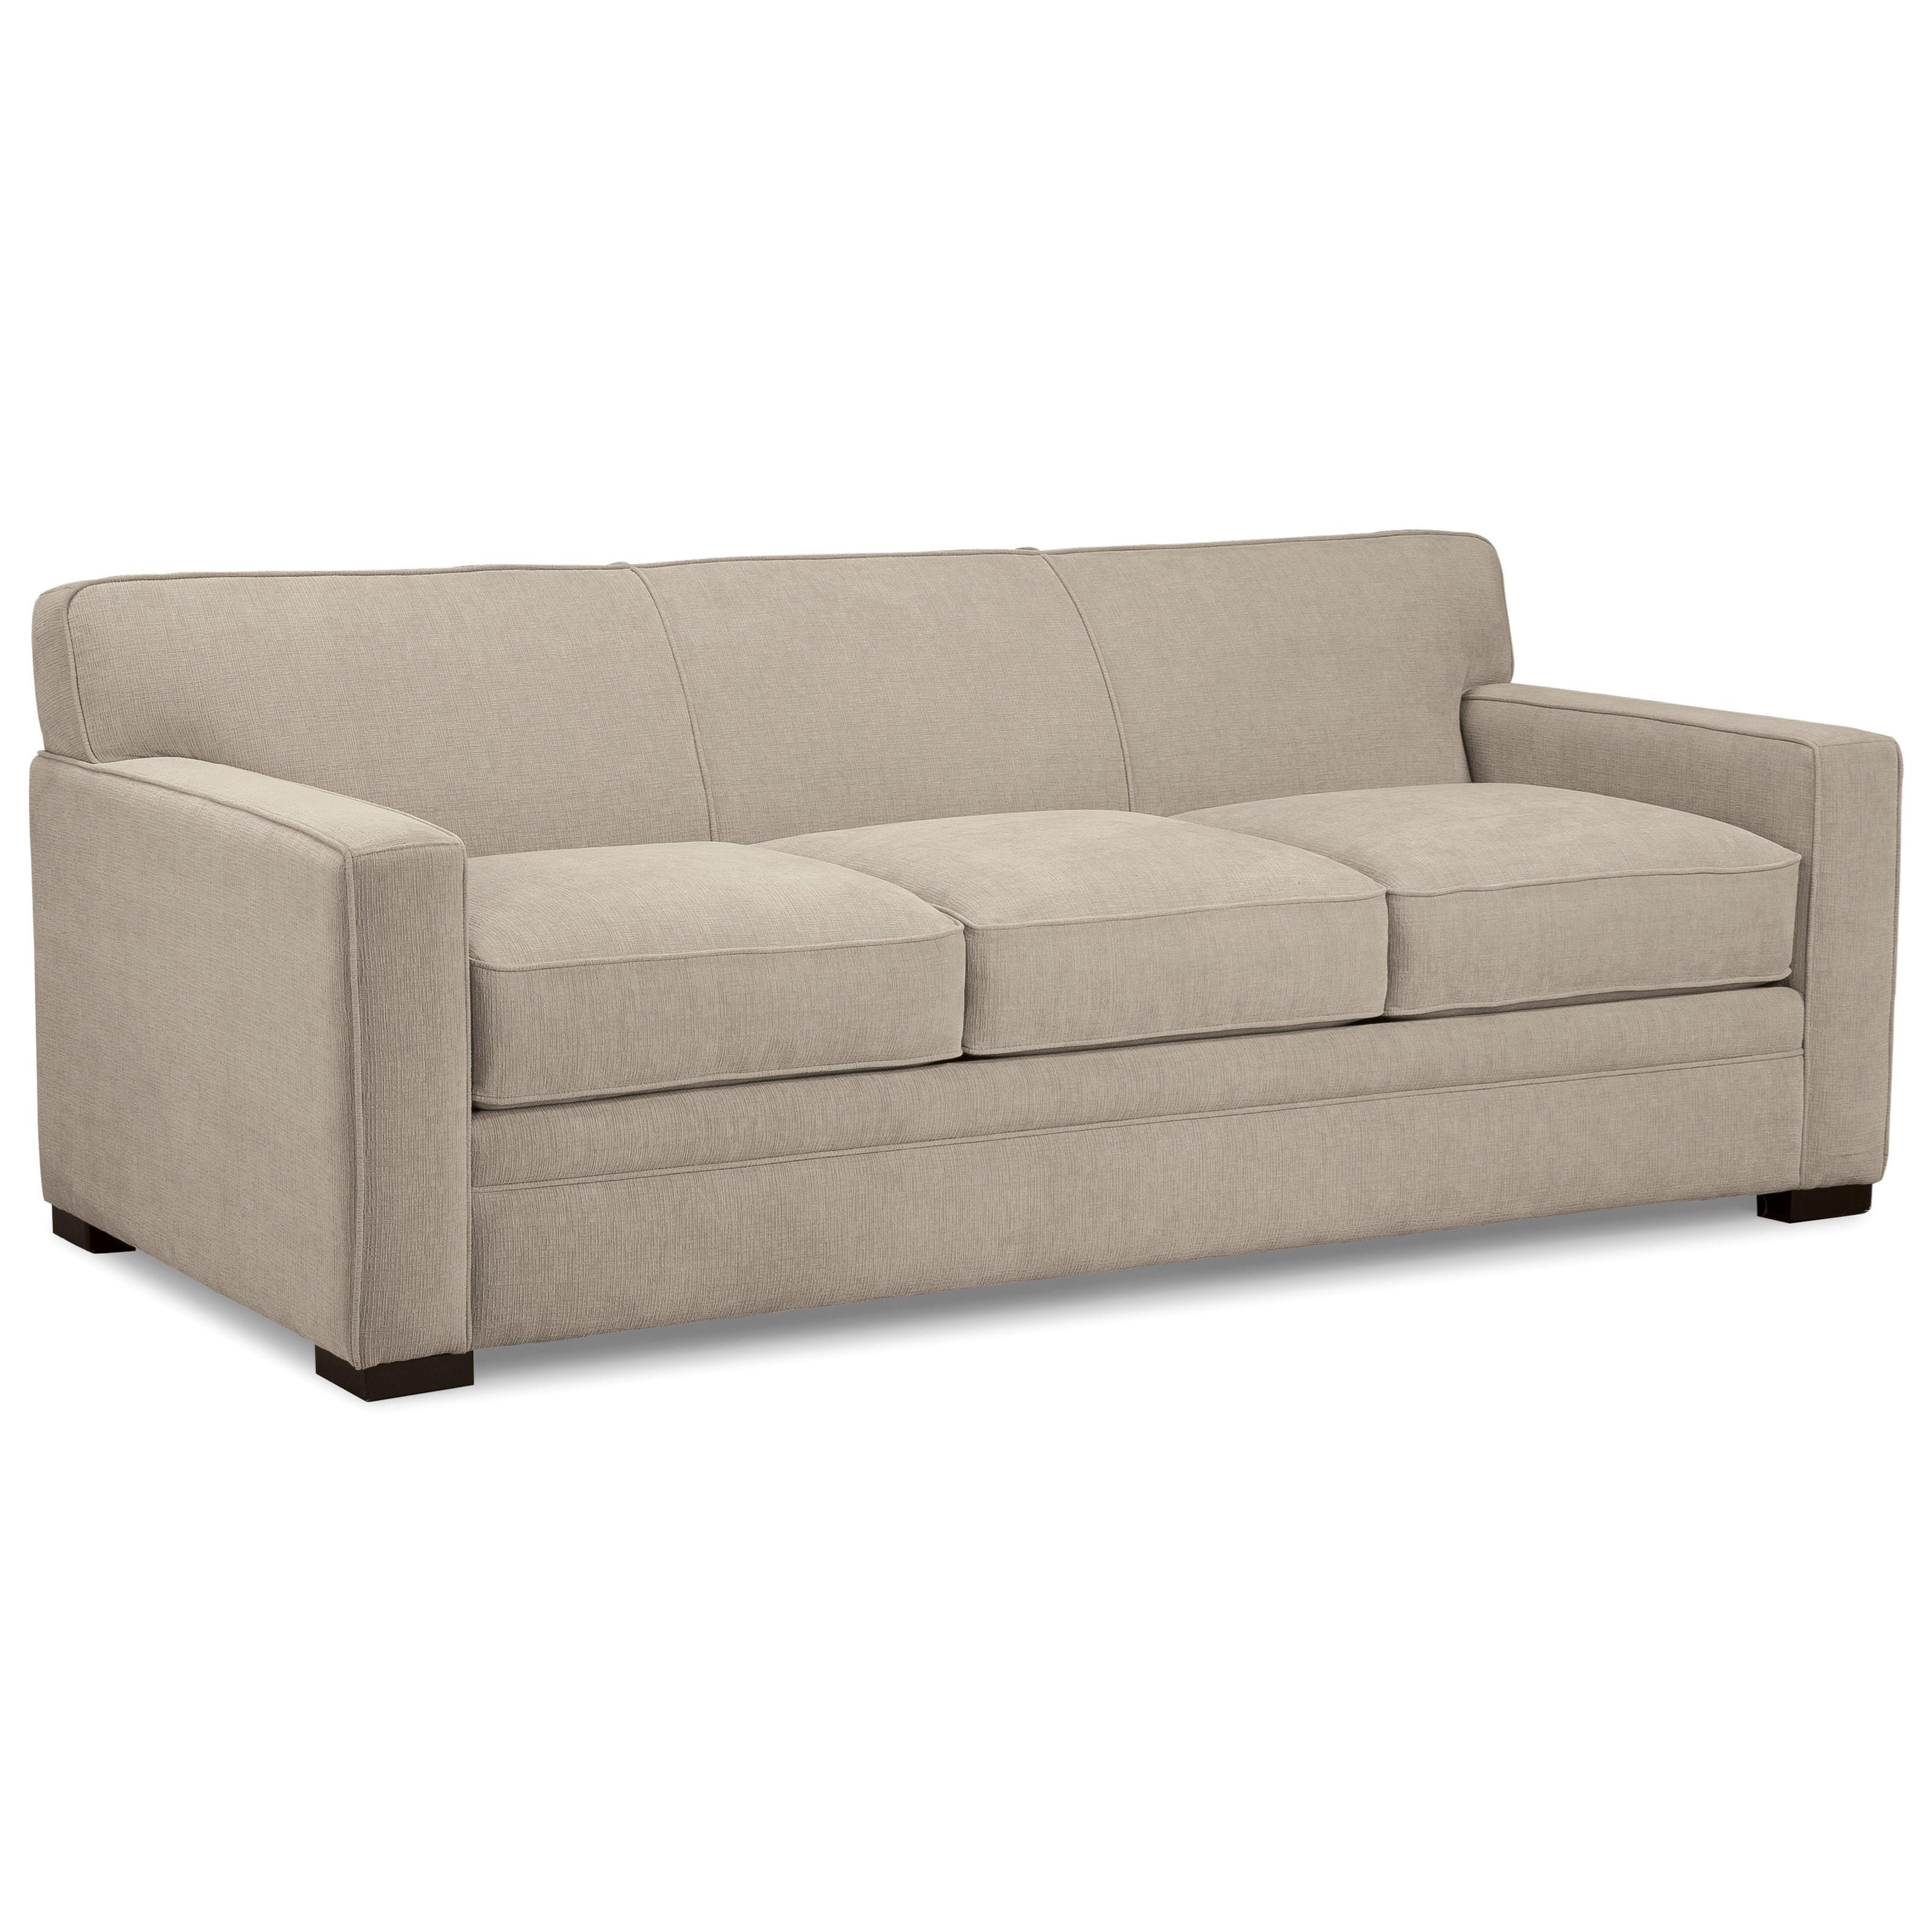 Nice Jonathan Louis SleepyQueen Sleeper Sofa